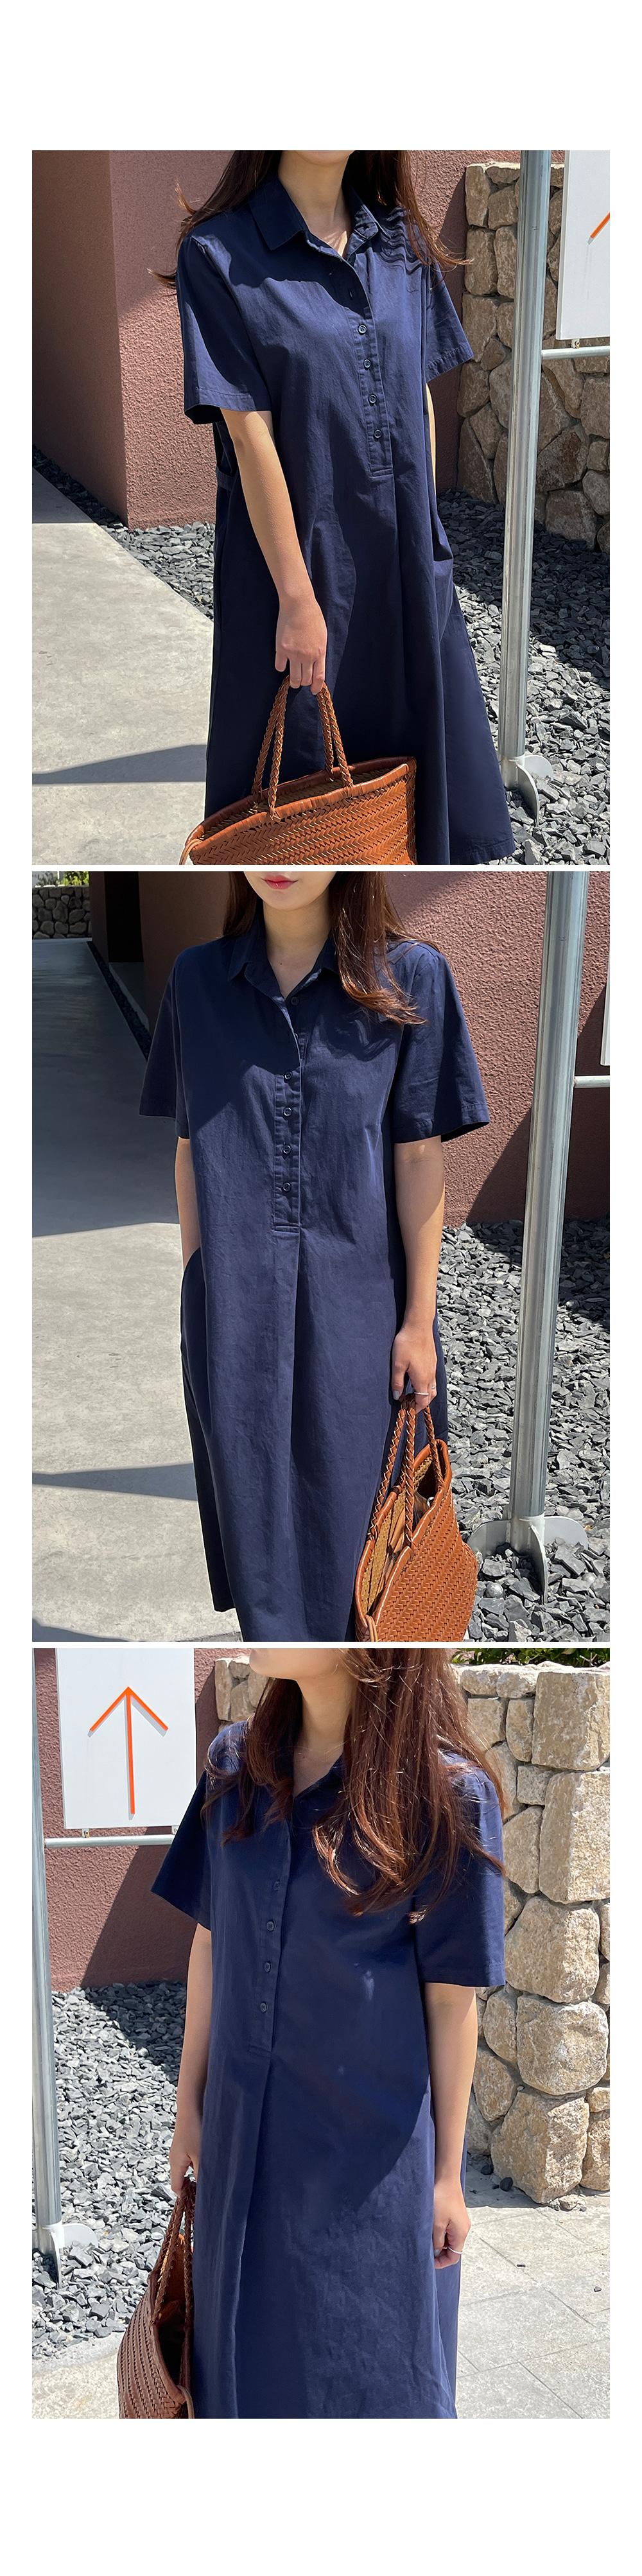 Jules Daily Cotton Shirt Dress-holiholic.com